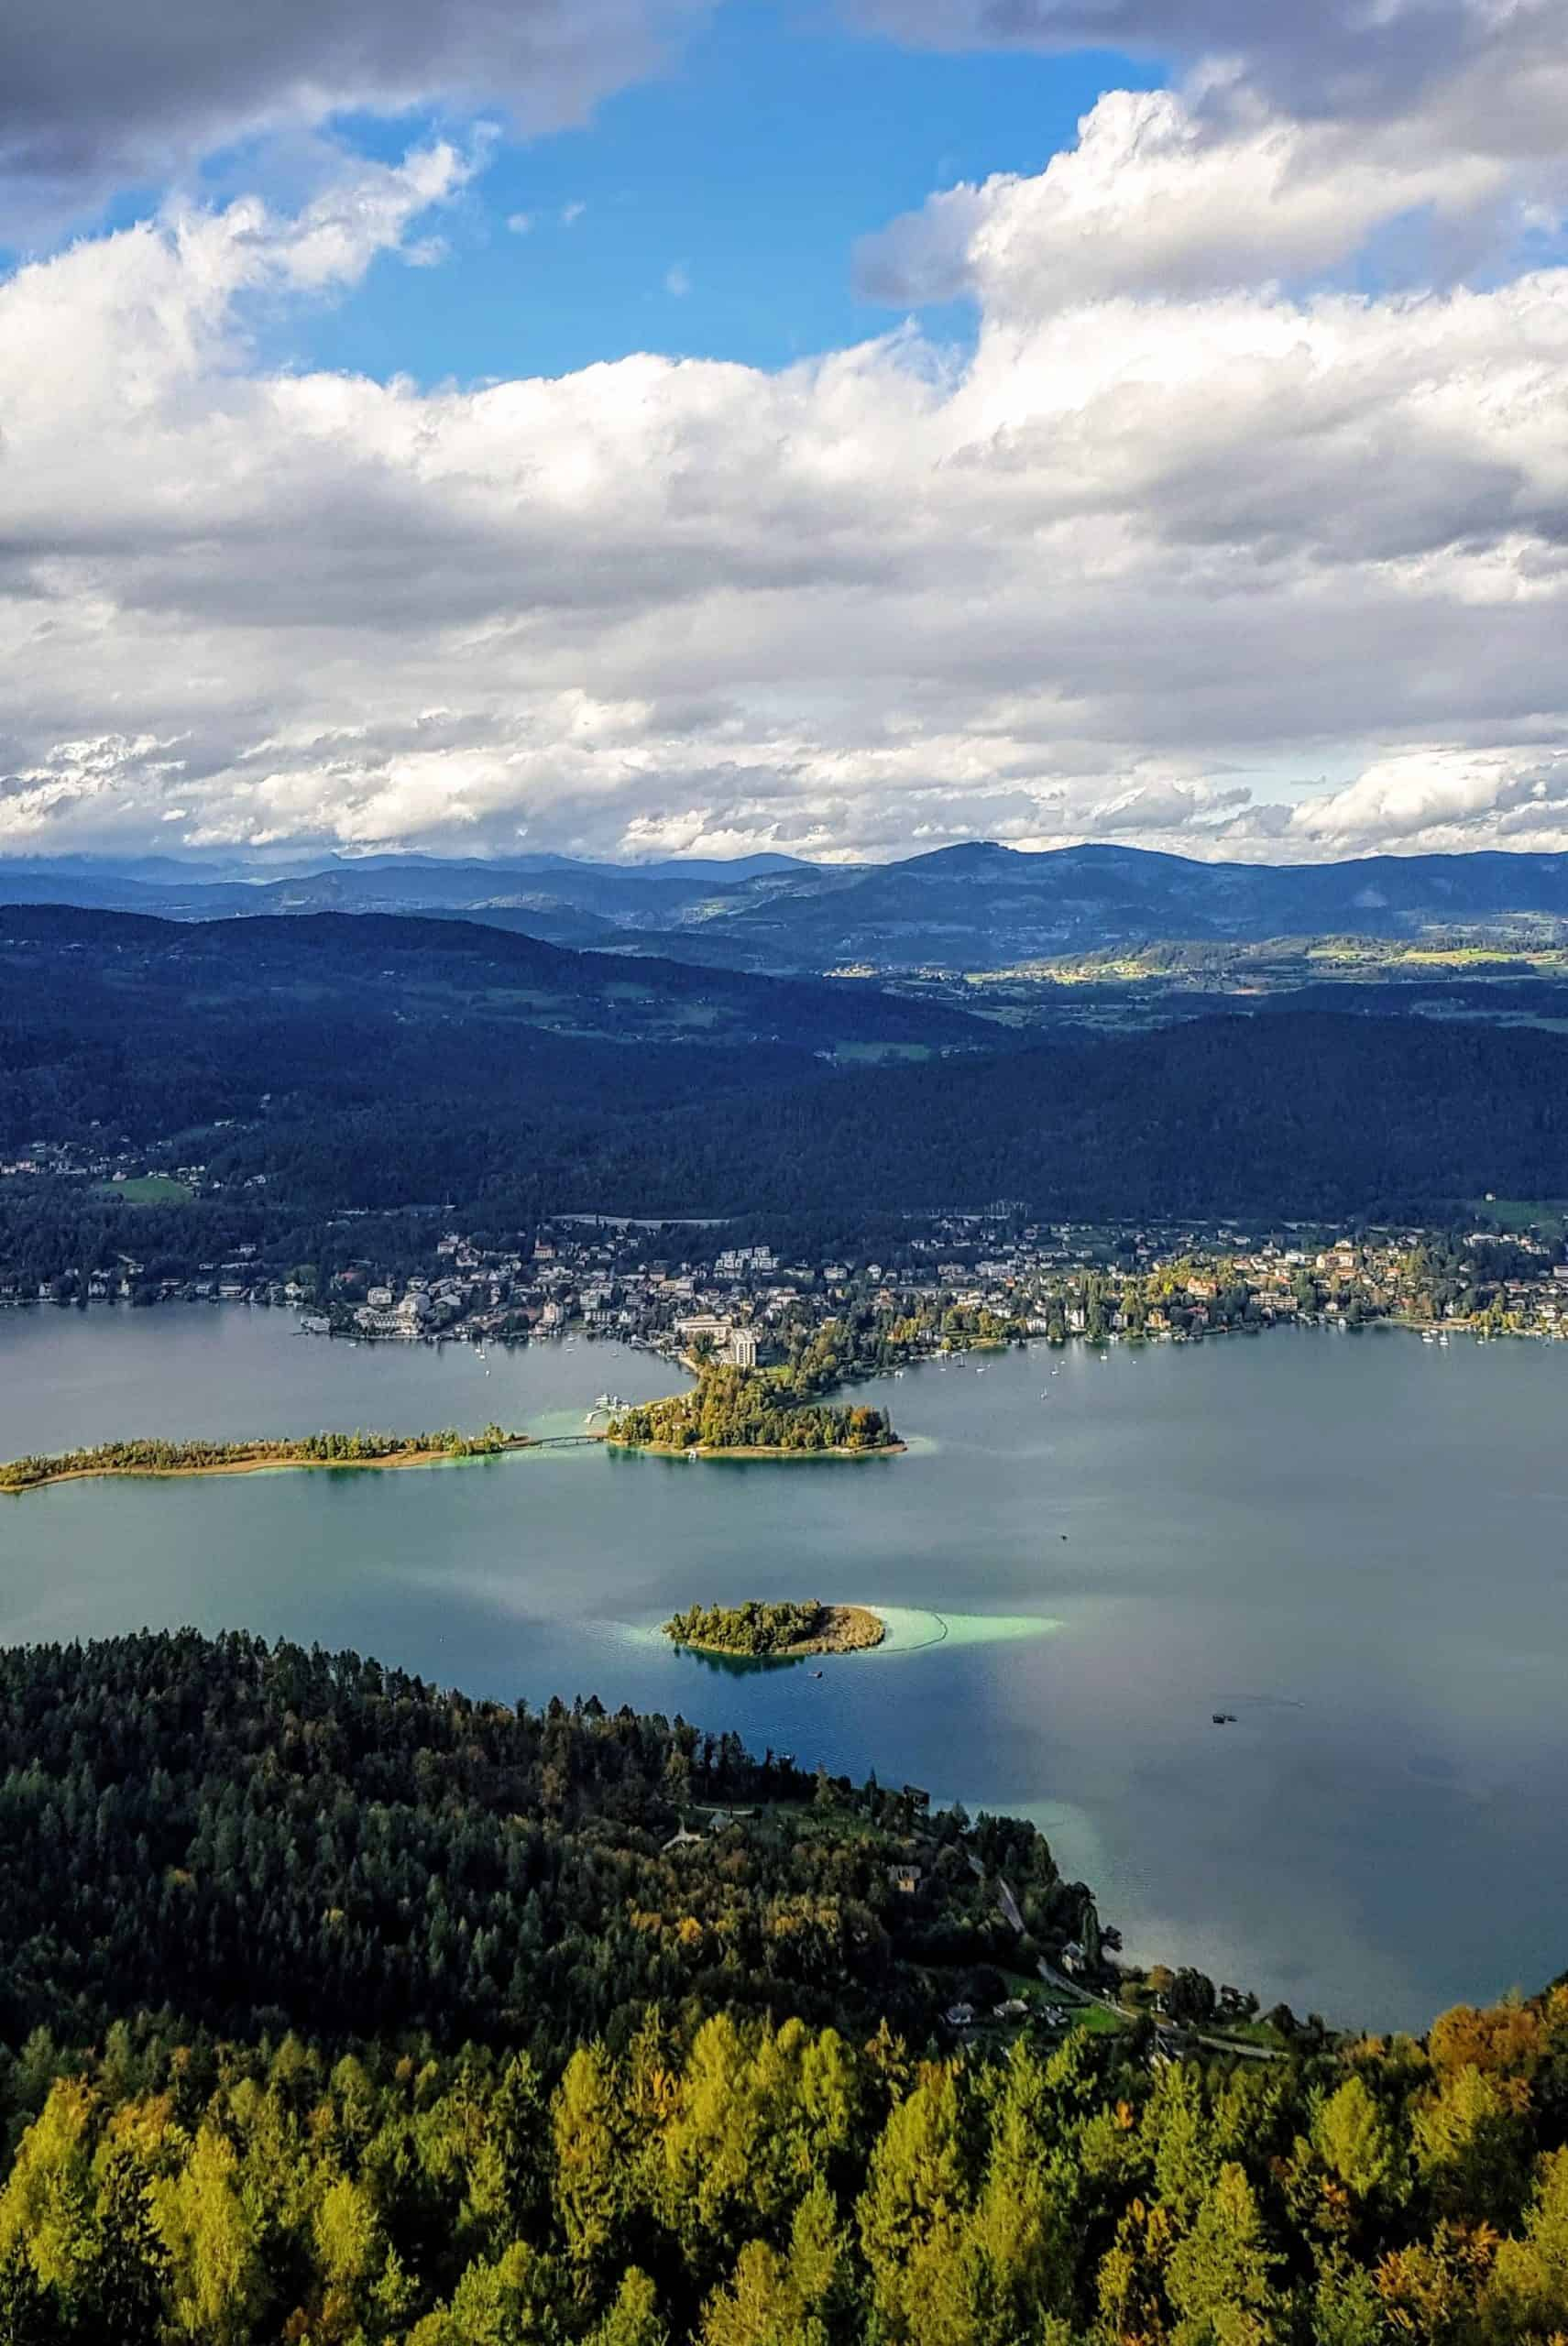 ganzjährig geöffnetes Ausflugsziel in Kärnten - Pyramidenkogel